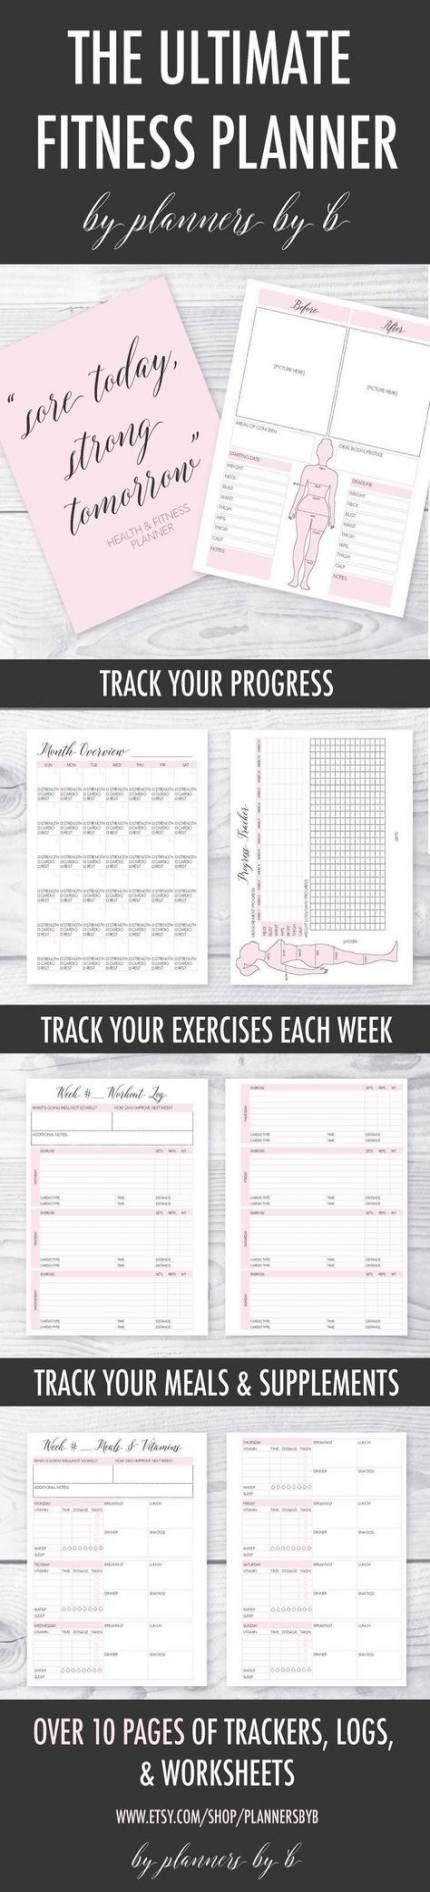 Best fitness planner diy track ideas #diy #fitness